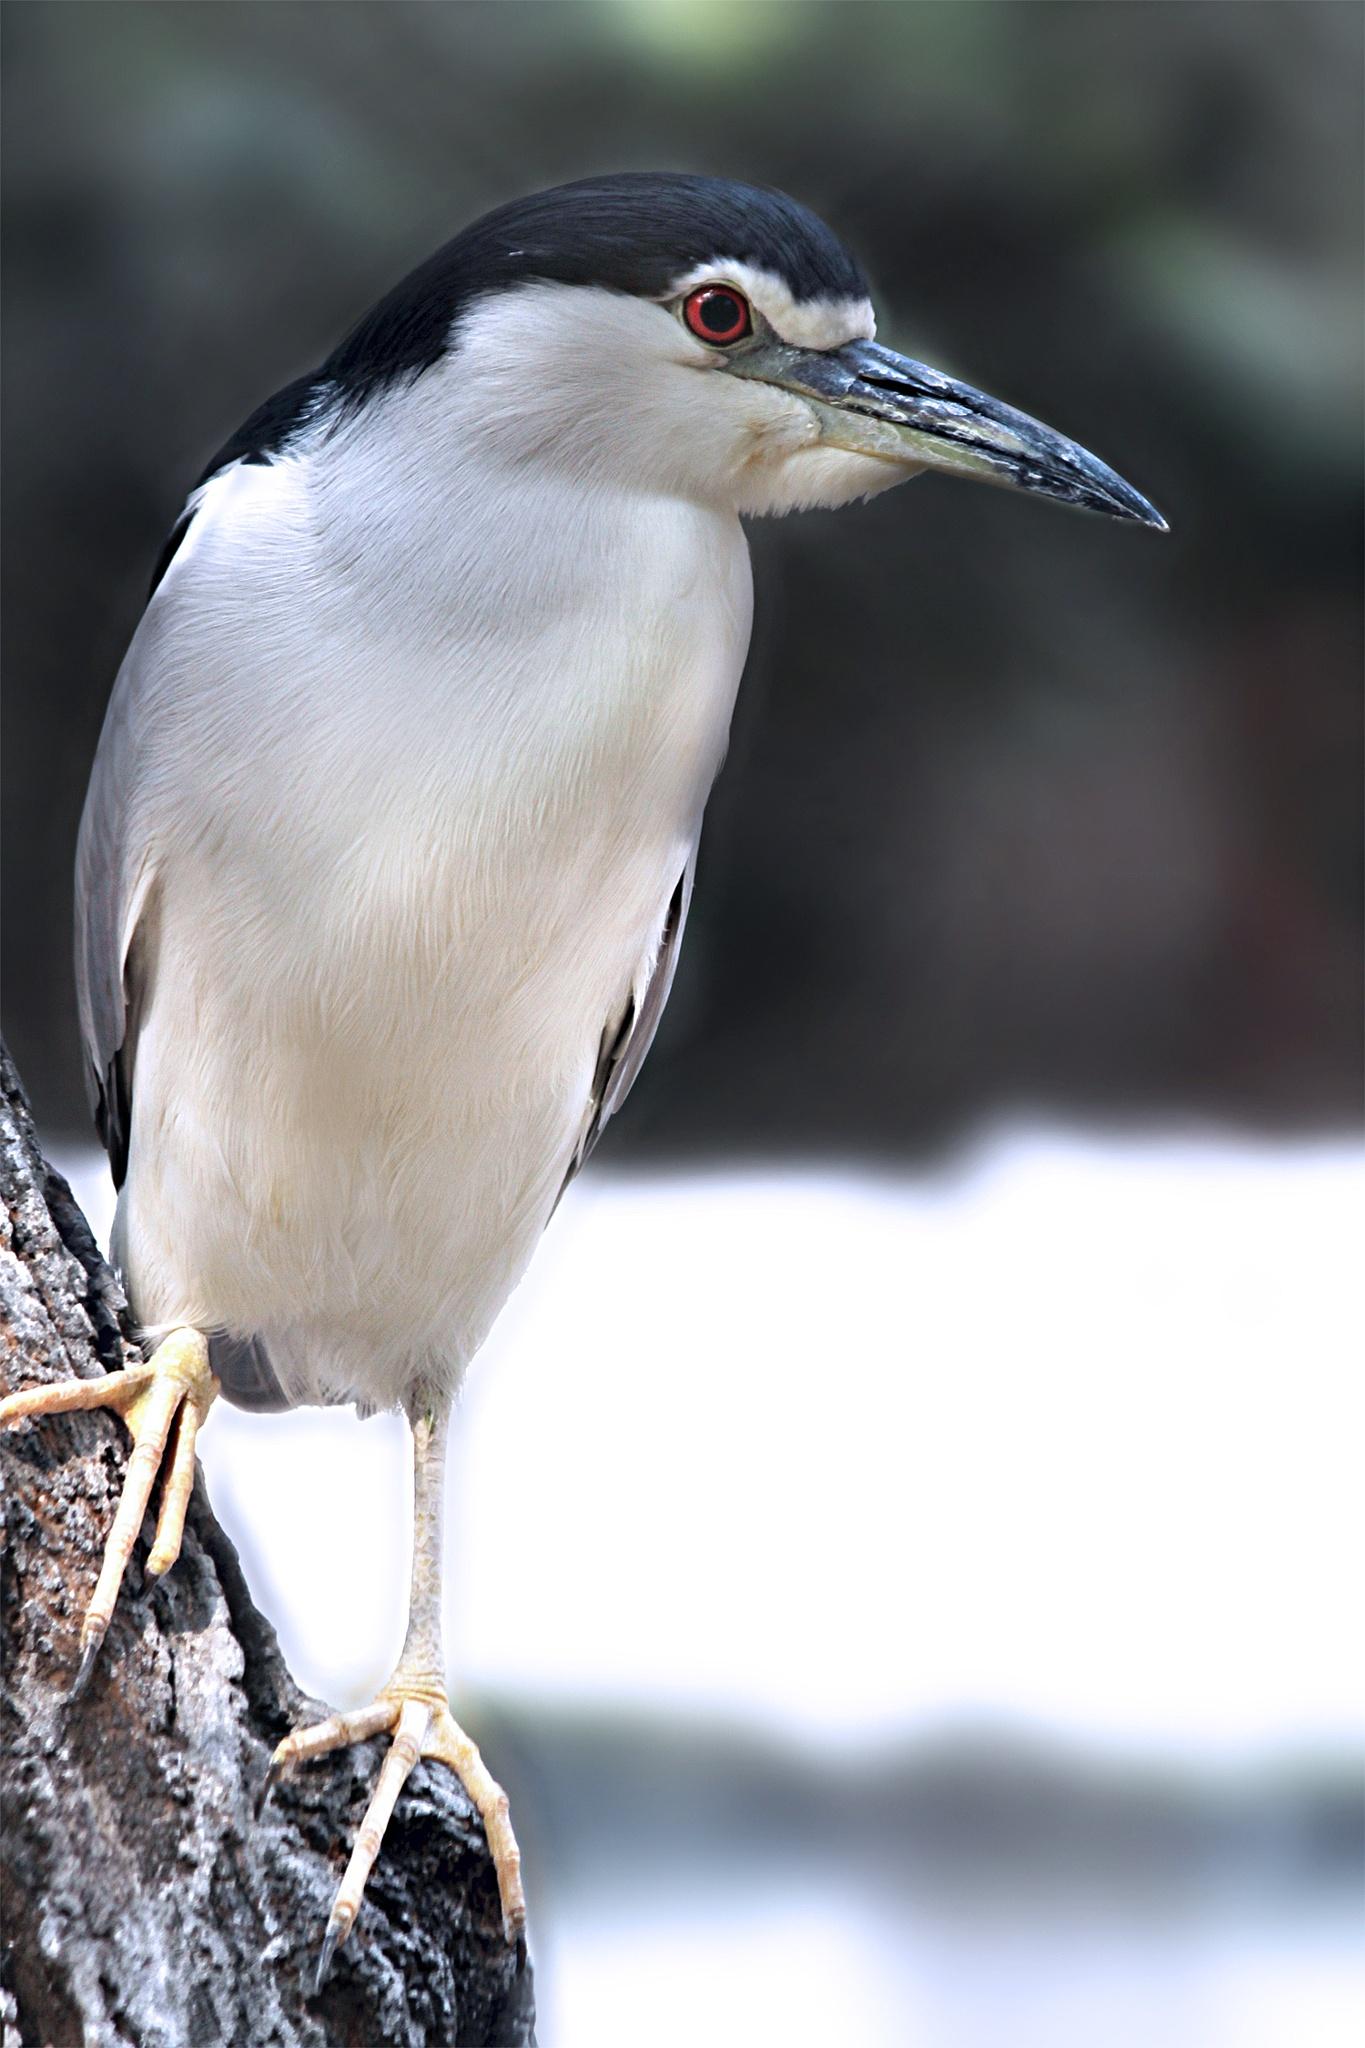 Grey Crowned Night Heron by Shashank Narsale